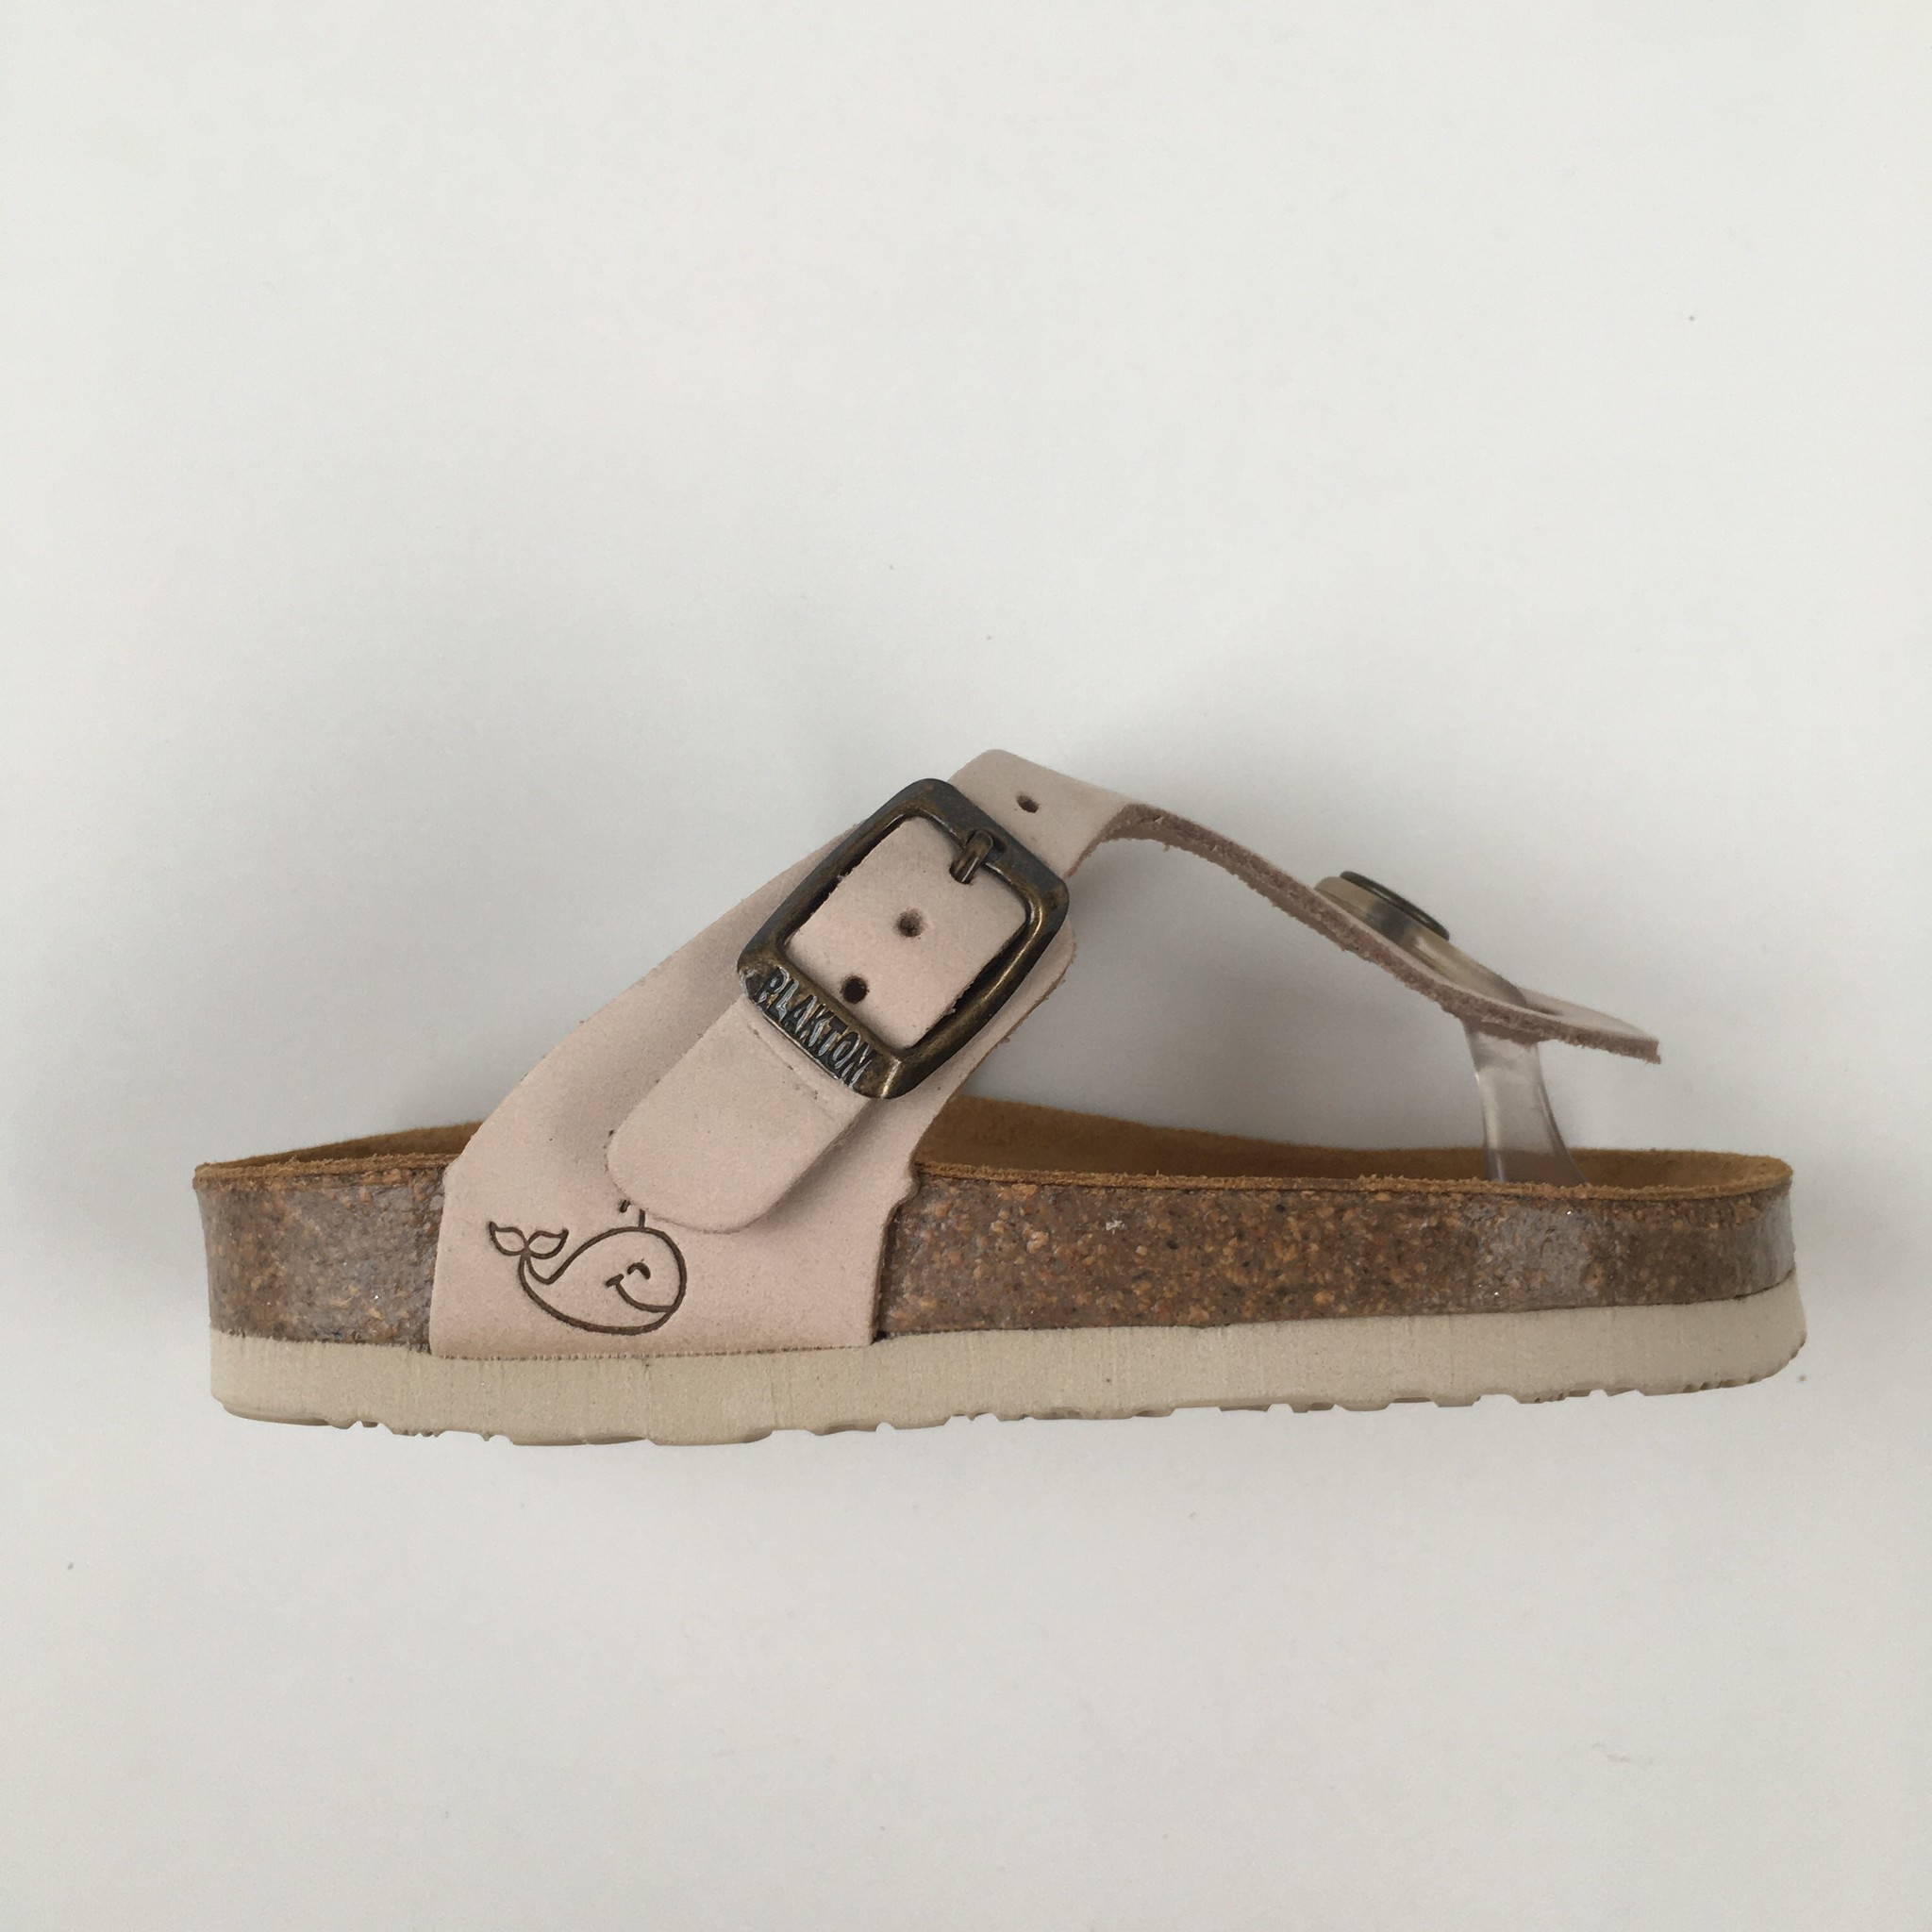 PLAKTON SANDALS leather children's slipper cork BOLERO - nubuck leather pale pink - 24 to 34